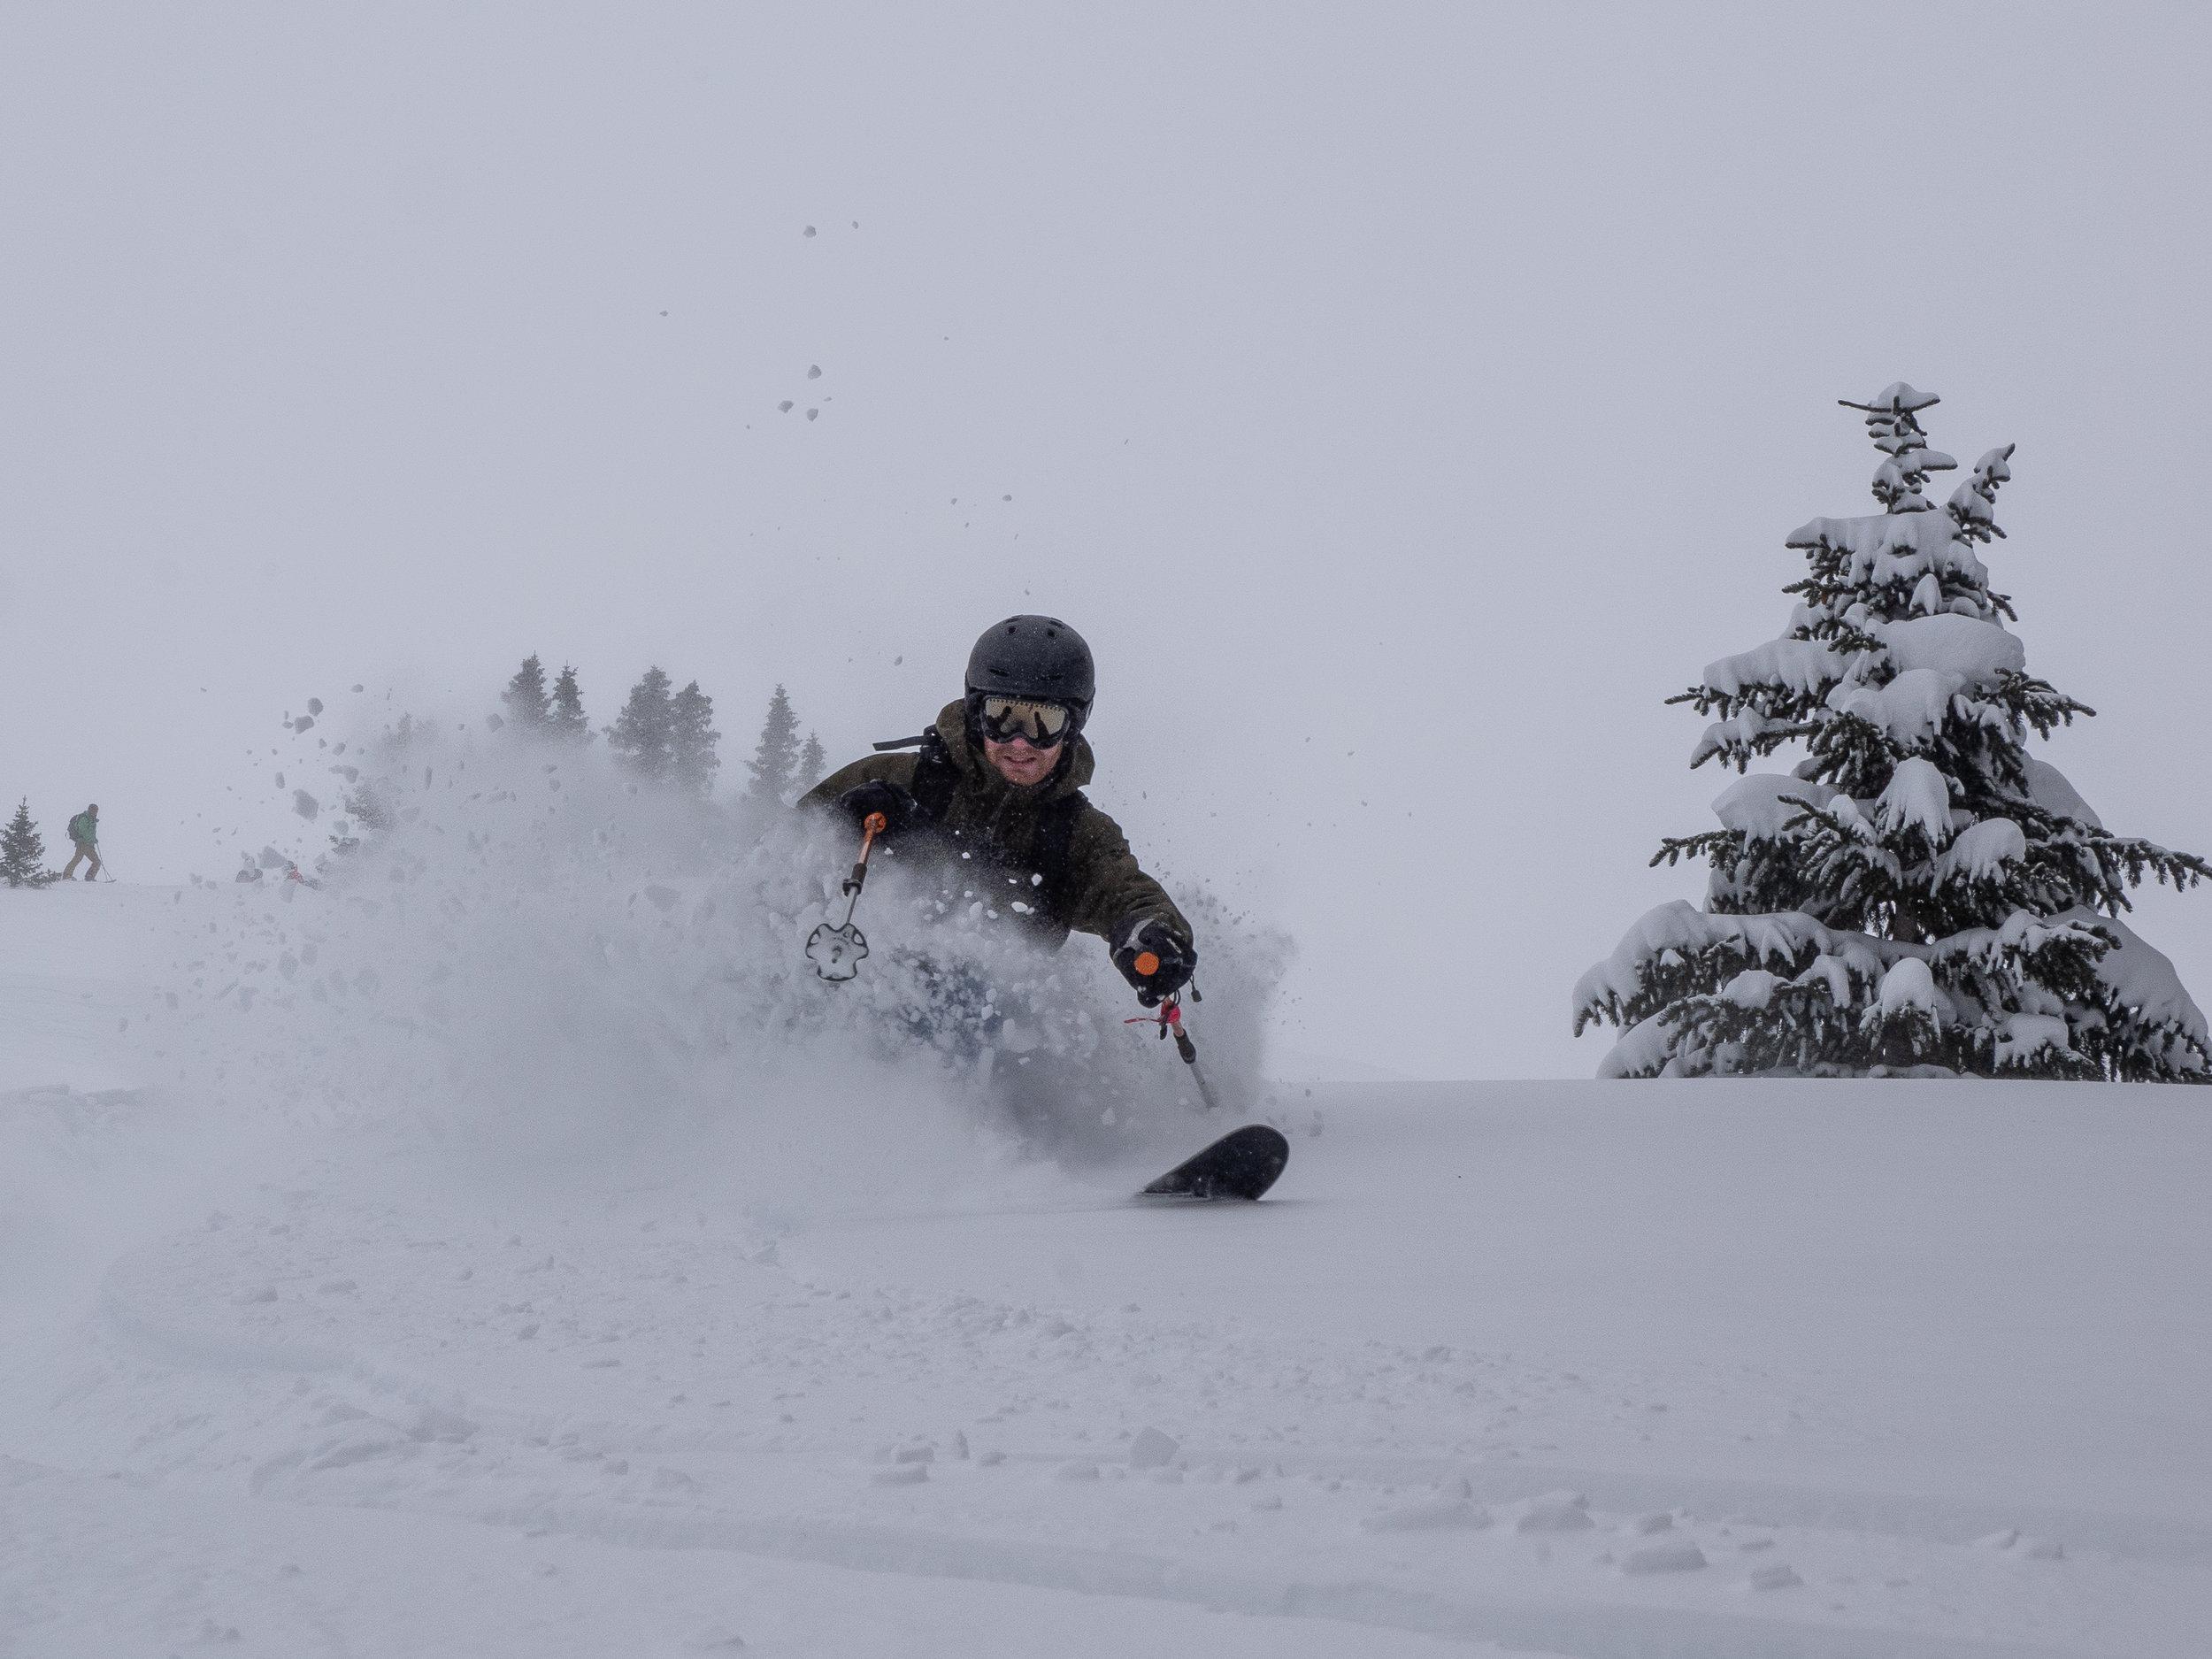 Sam demonstrates his snow art talents.